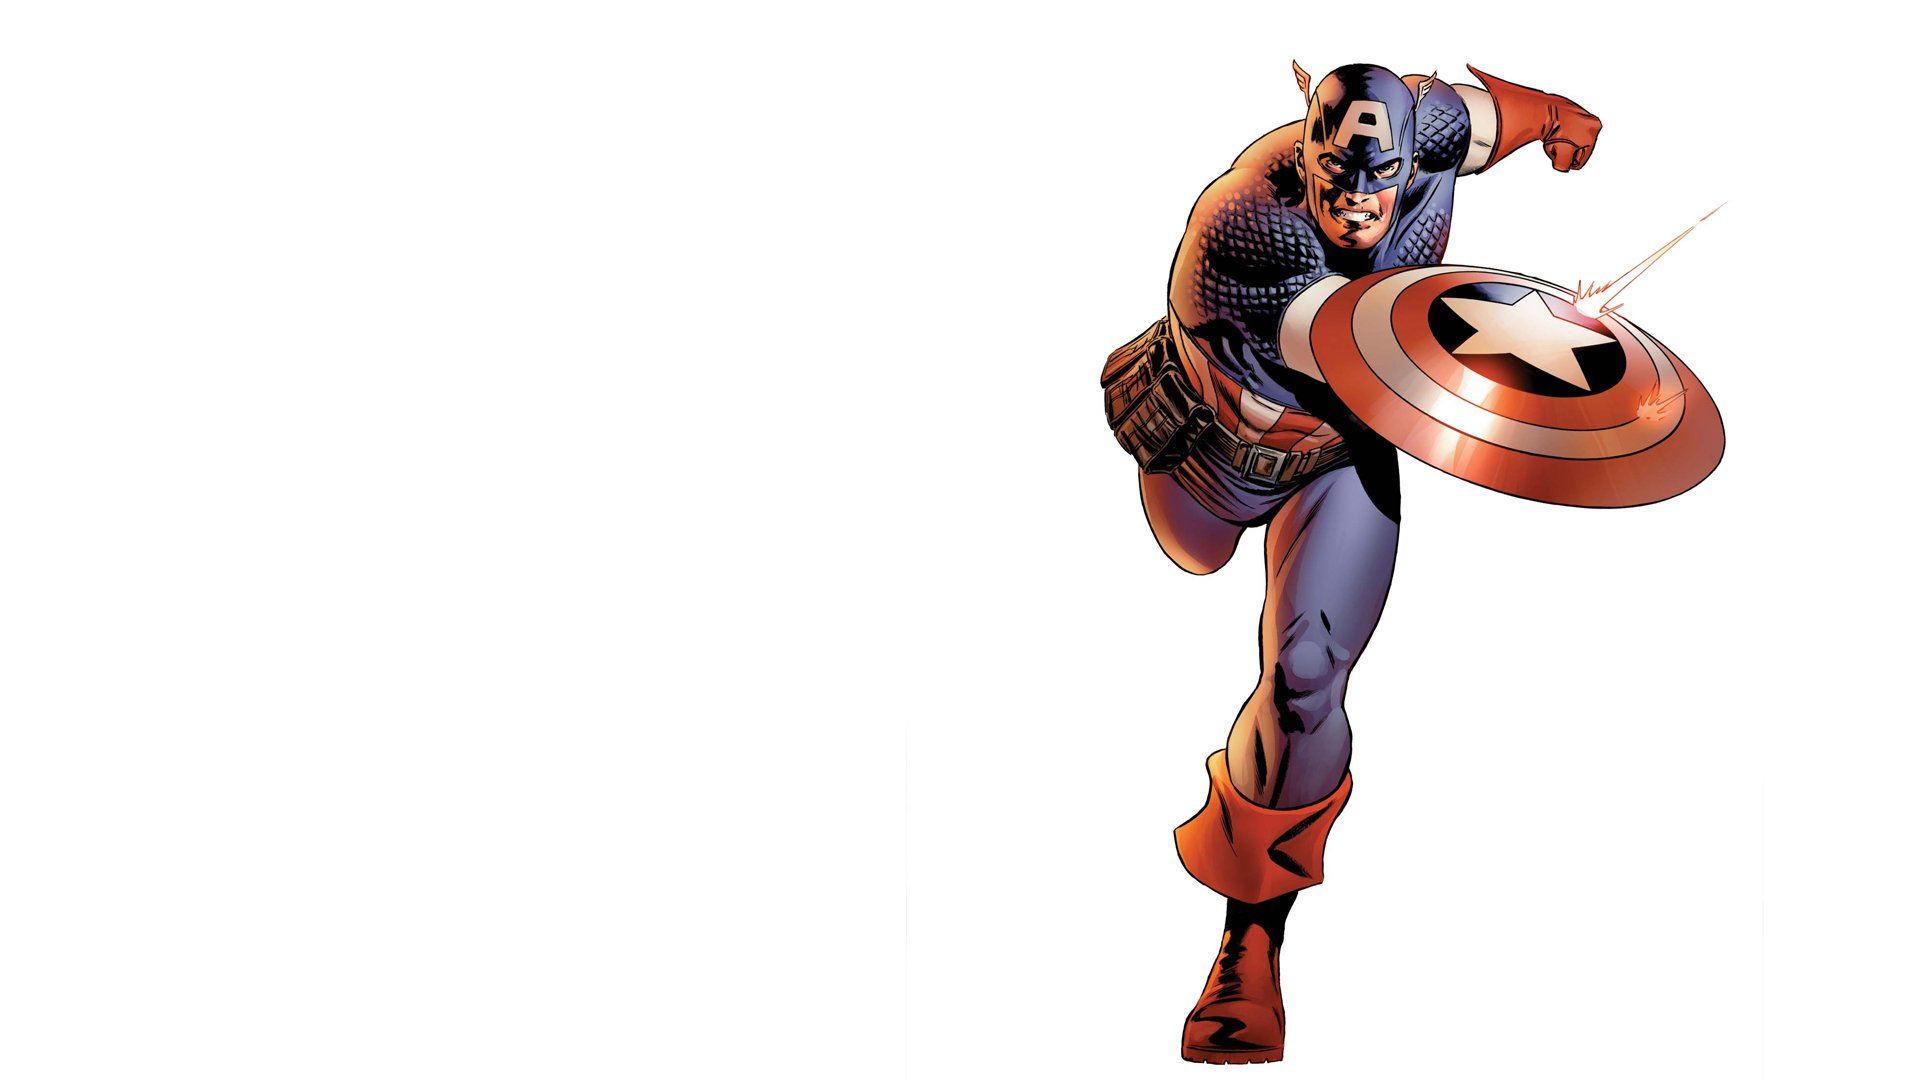 Captain America Hd Wallpaper Background Image 1920x1080 Id